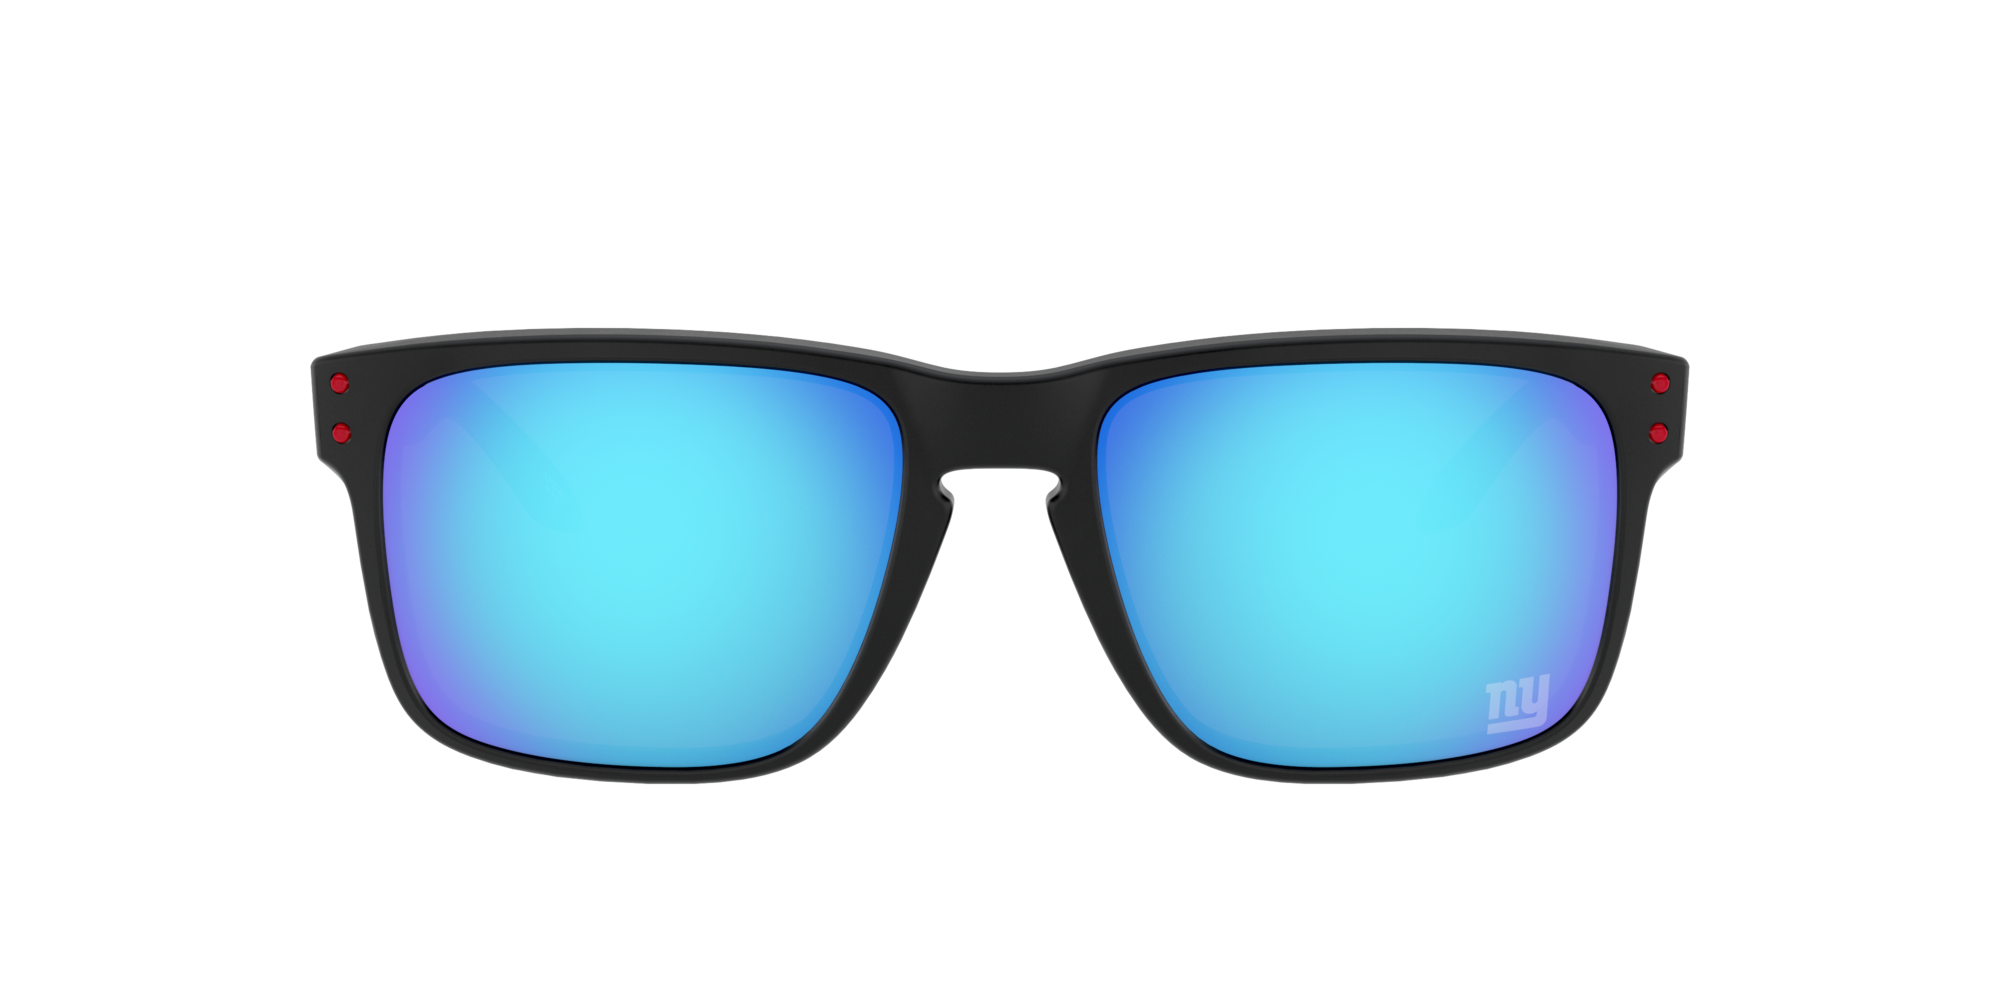 Image for OO9102 55 HOLBROOK from LensCrafters | Glasses, Prescription Glasses Online, Eyewear